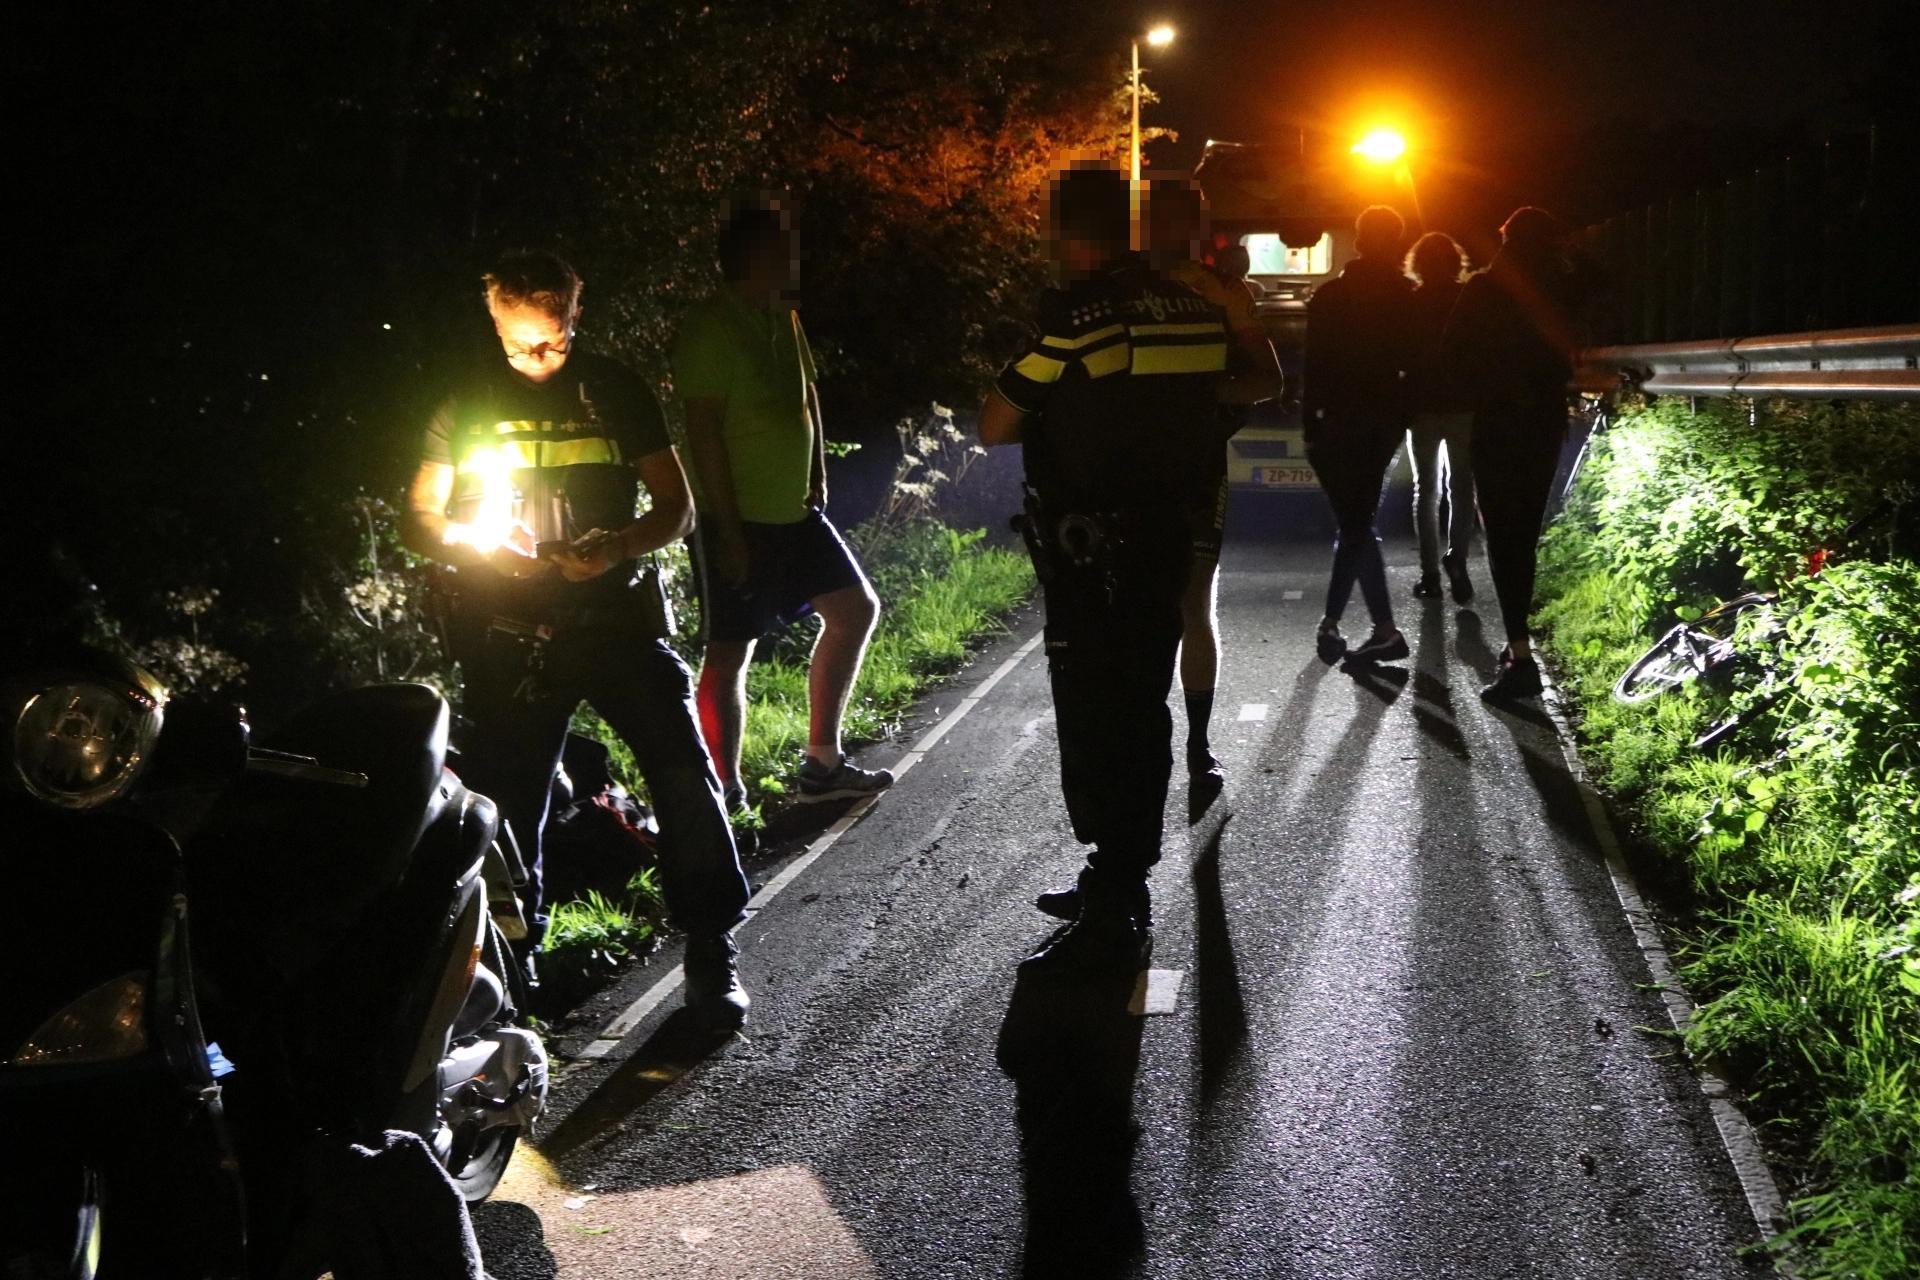 Wielrenner gewond bij frontale botsing met scooterrijder in Sassenheim